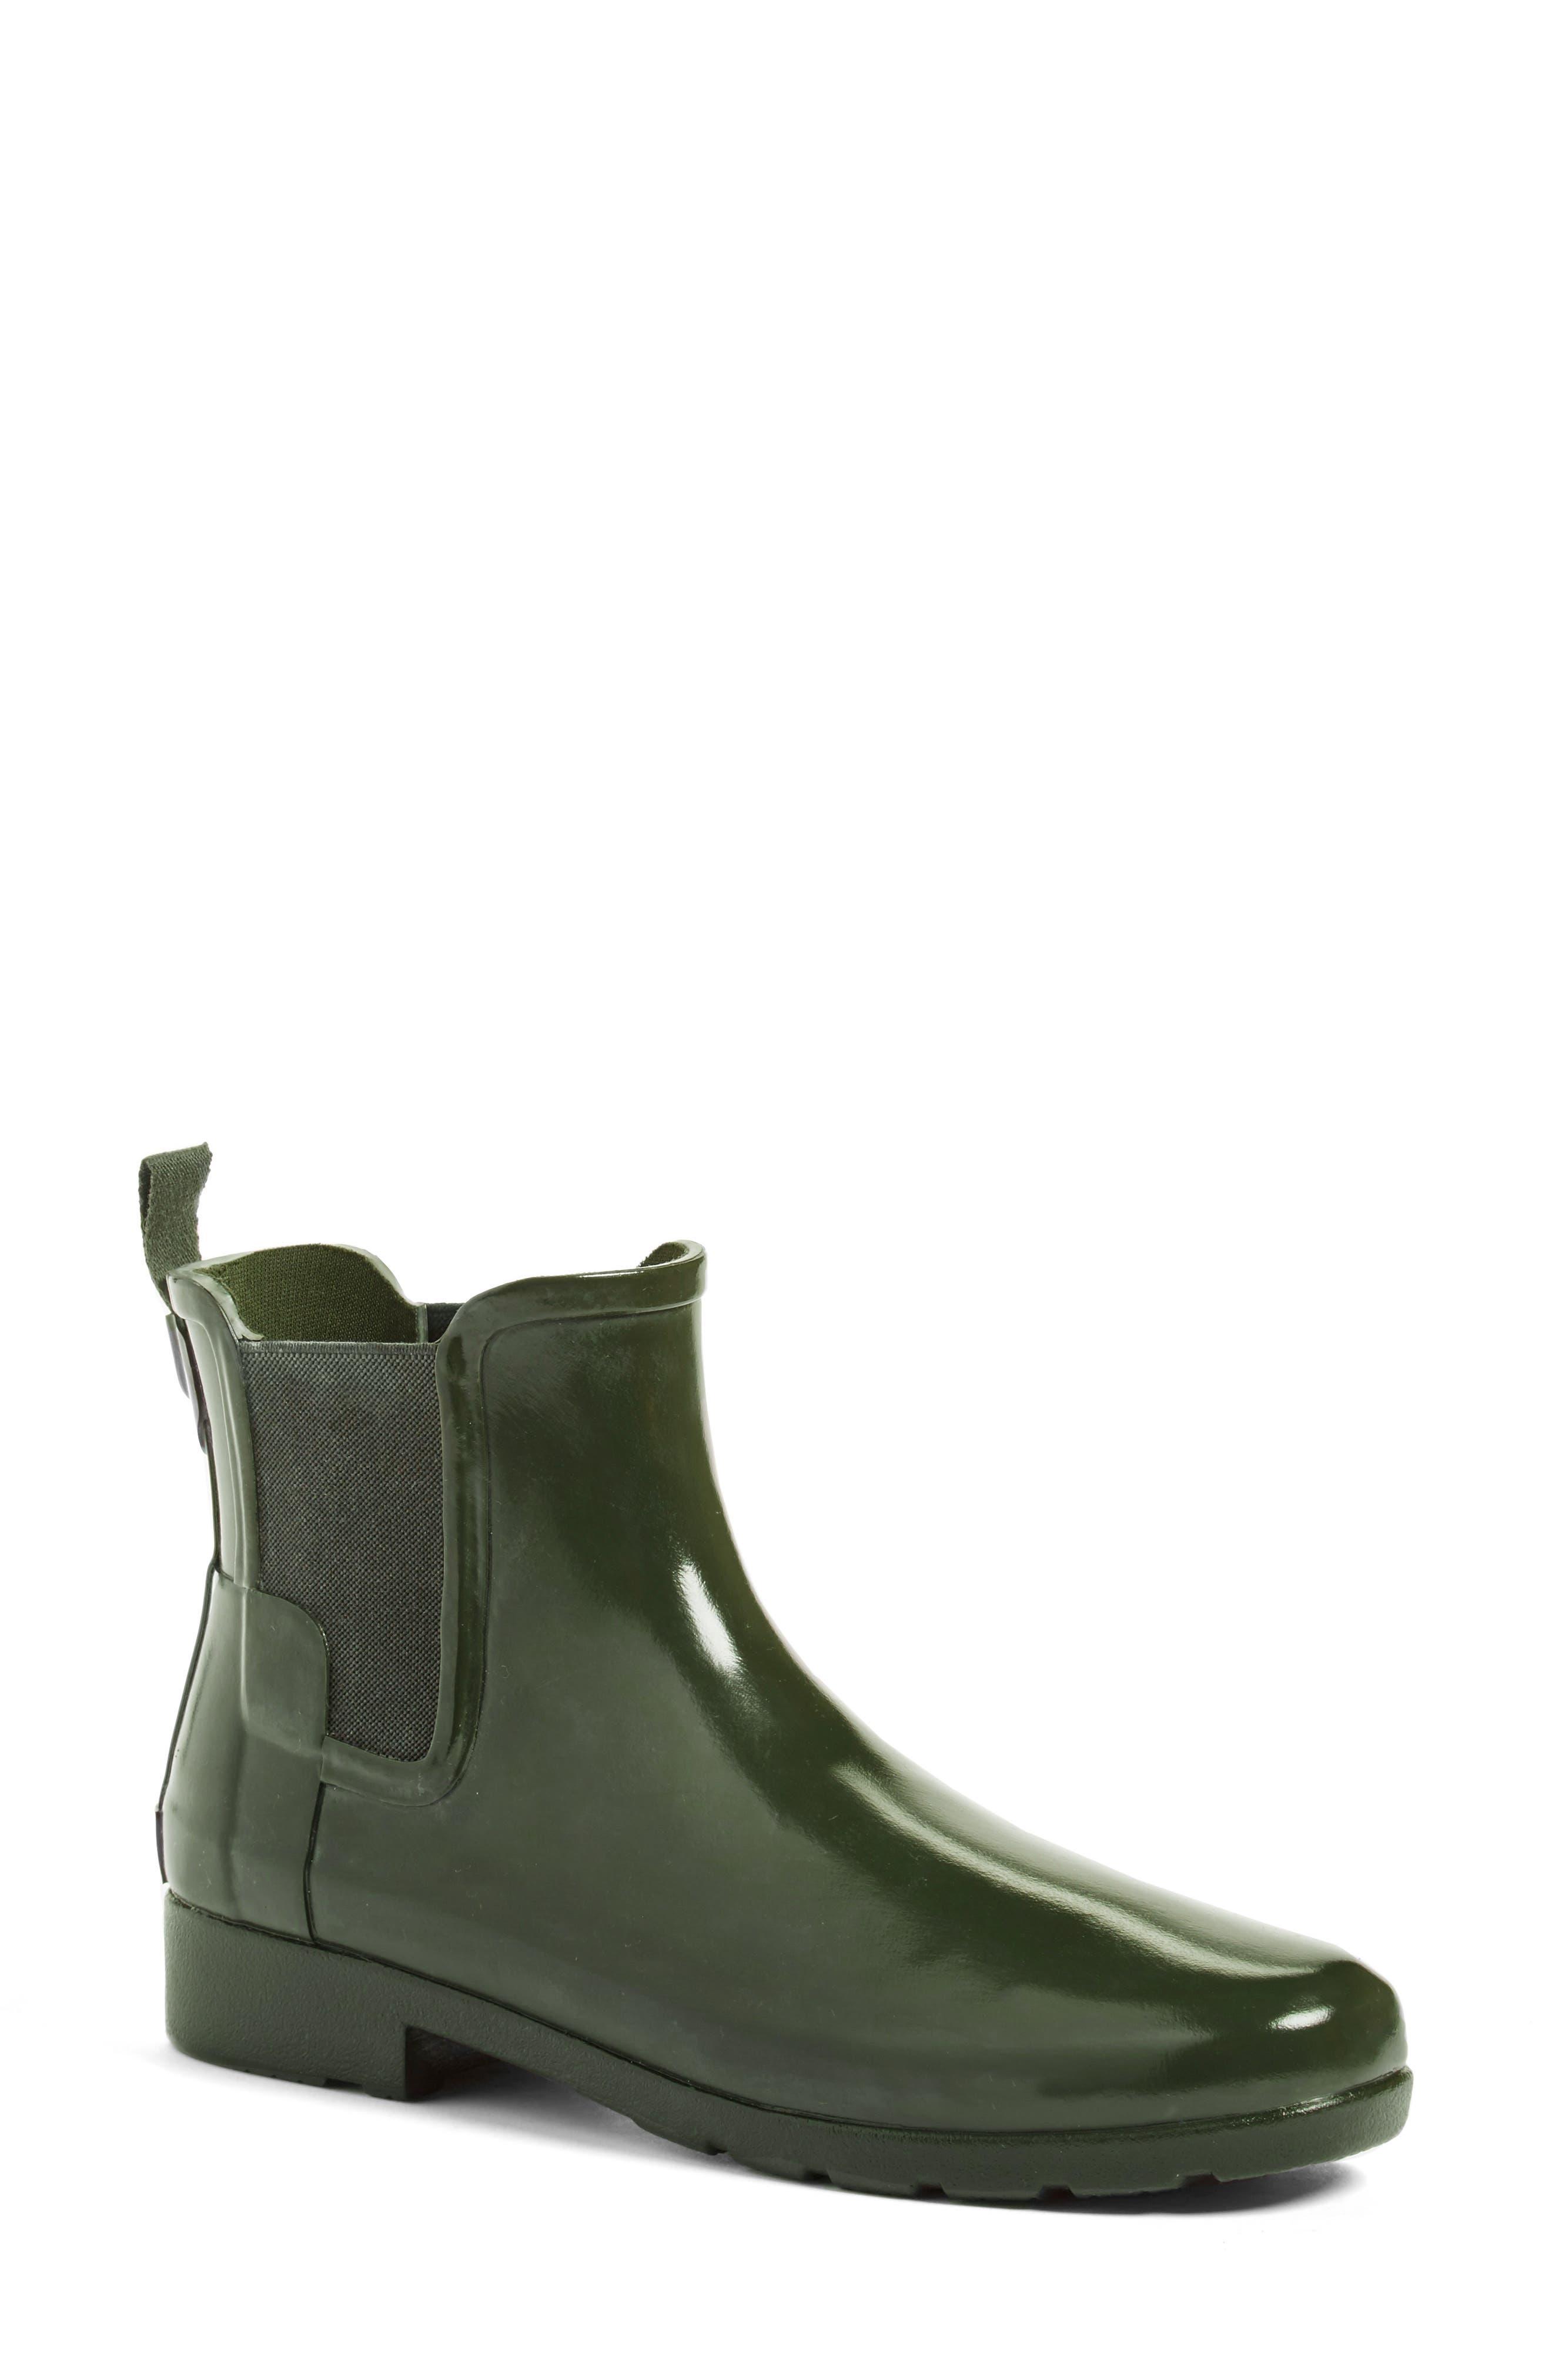 Main Image - Hunter 'Original Refined' Chelsea Rain Boot (Women)